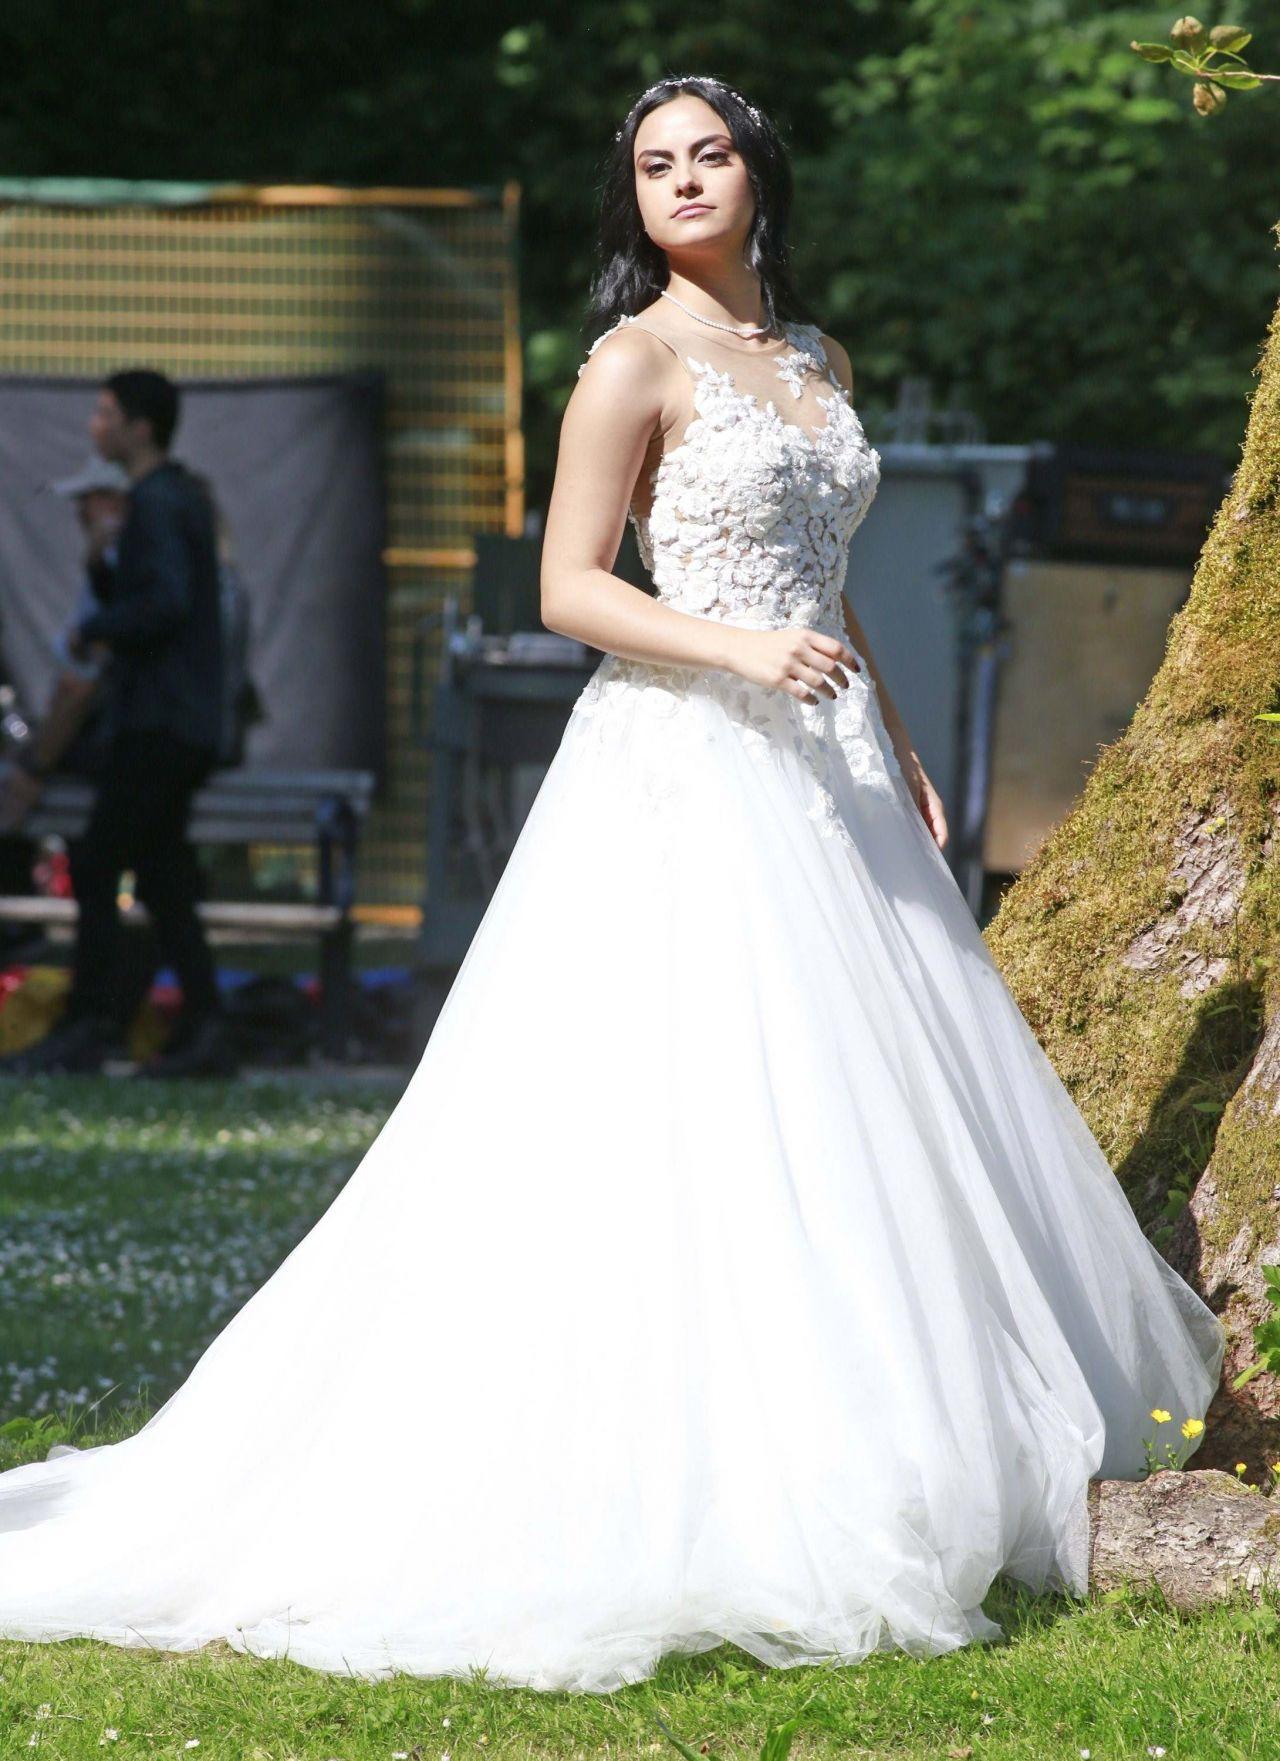 Camila Mendes Quot Riverdale Quot Set At Barnet Marine Park In